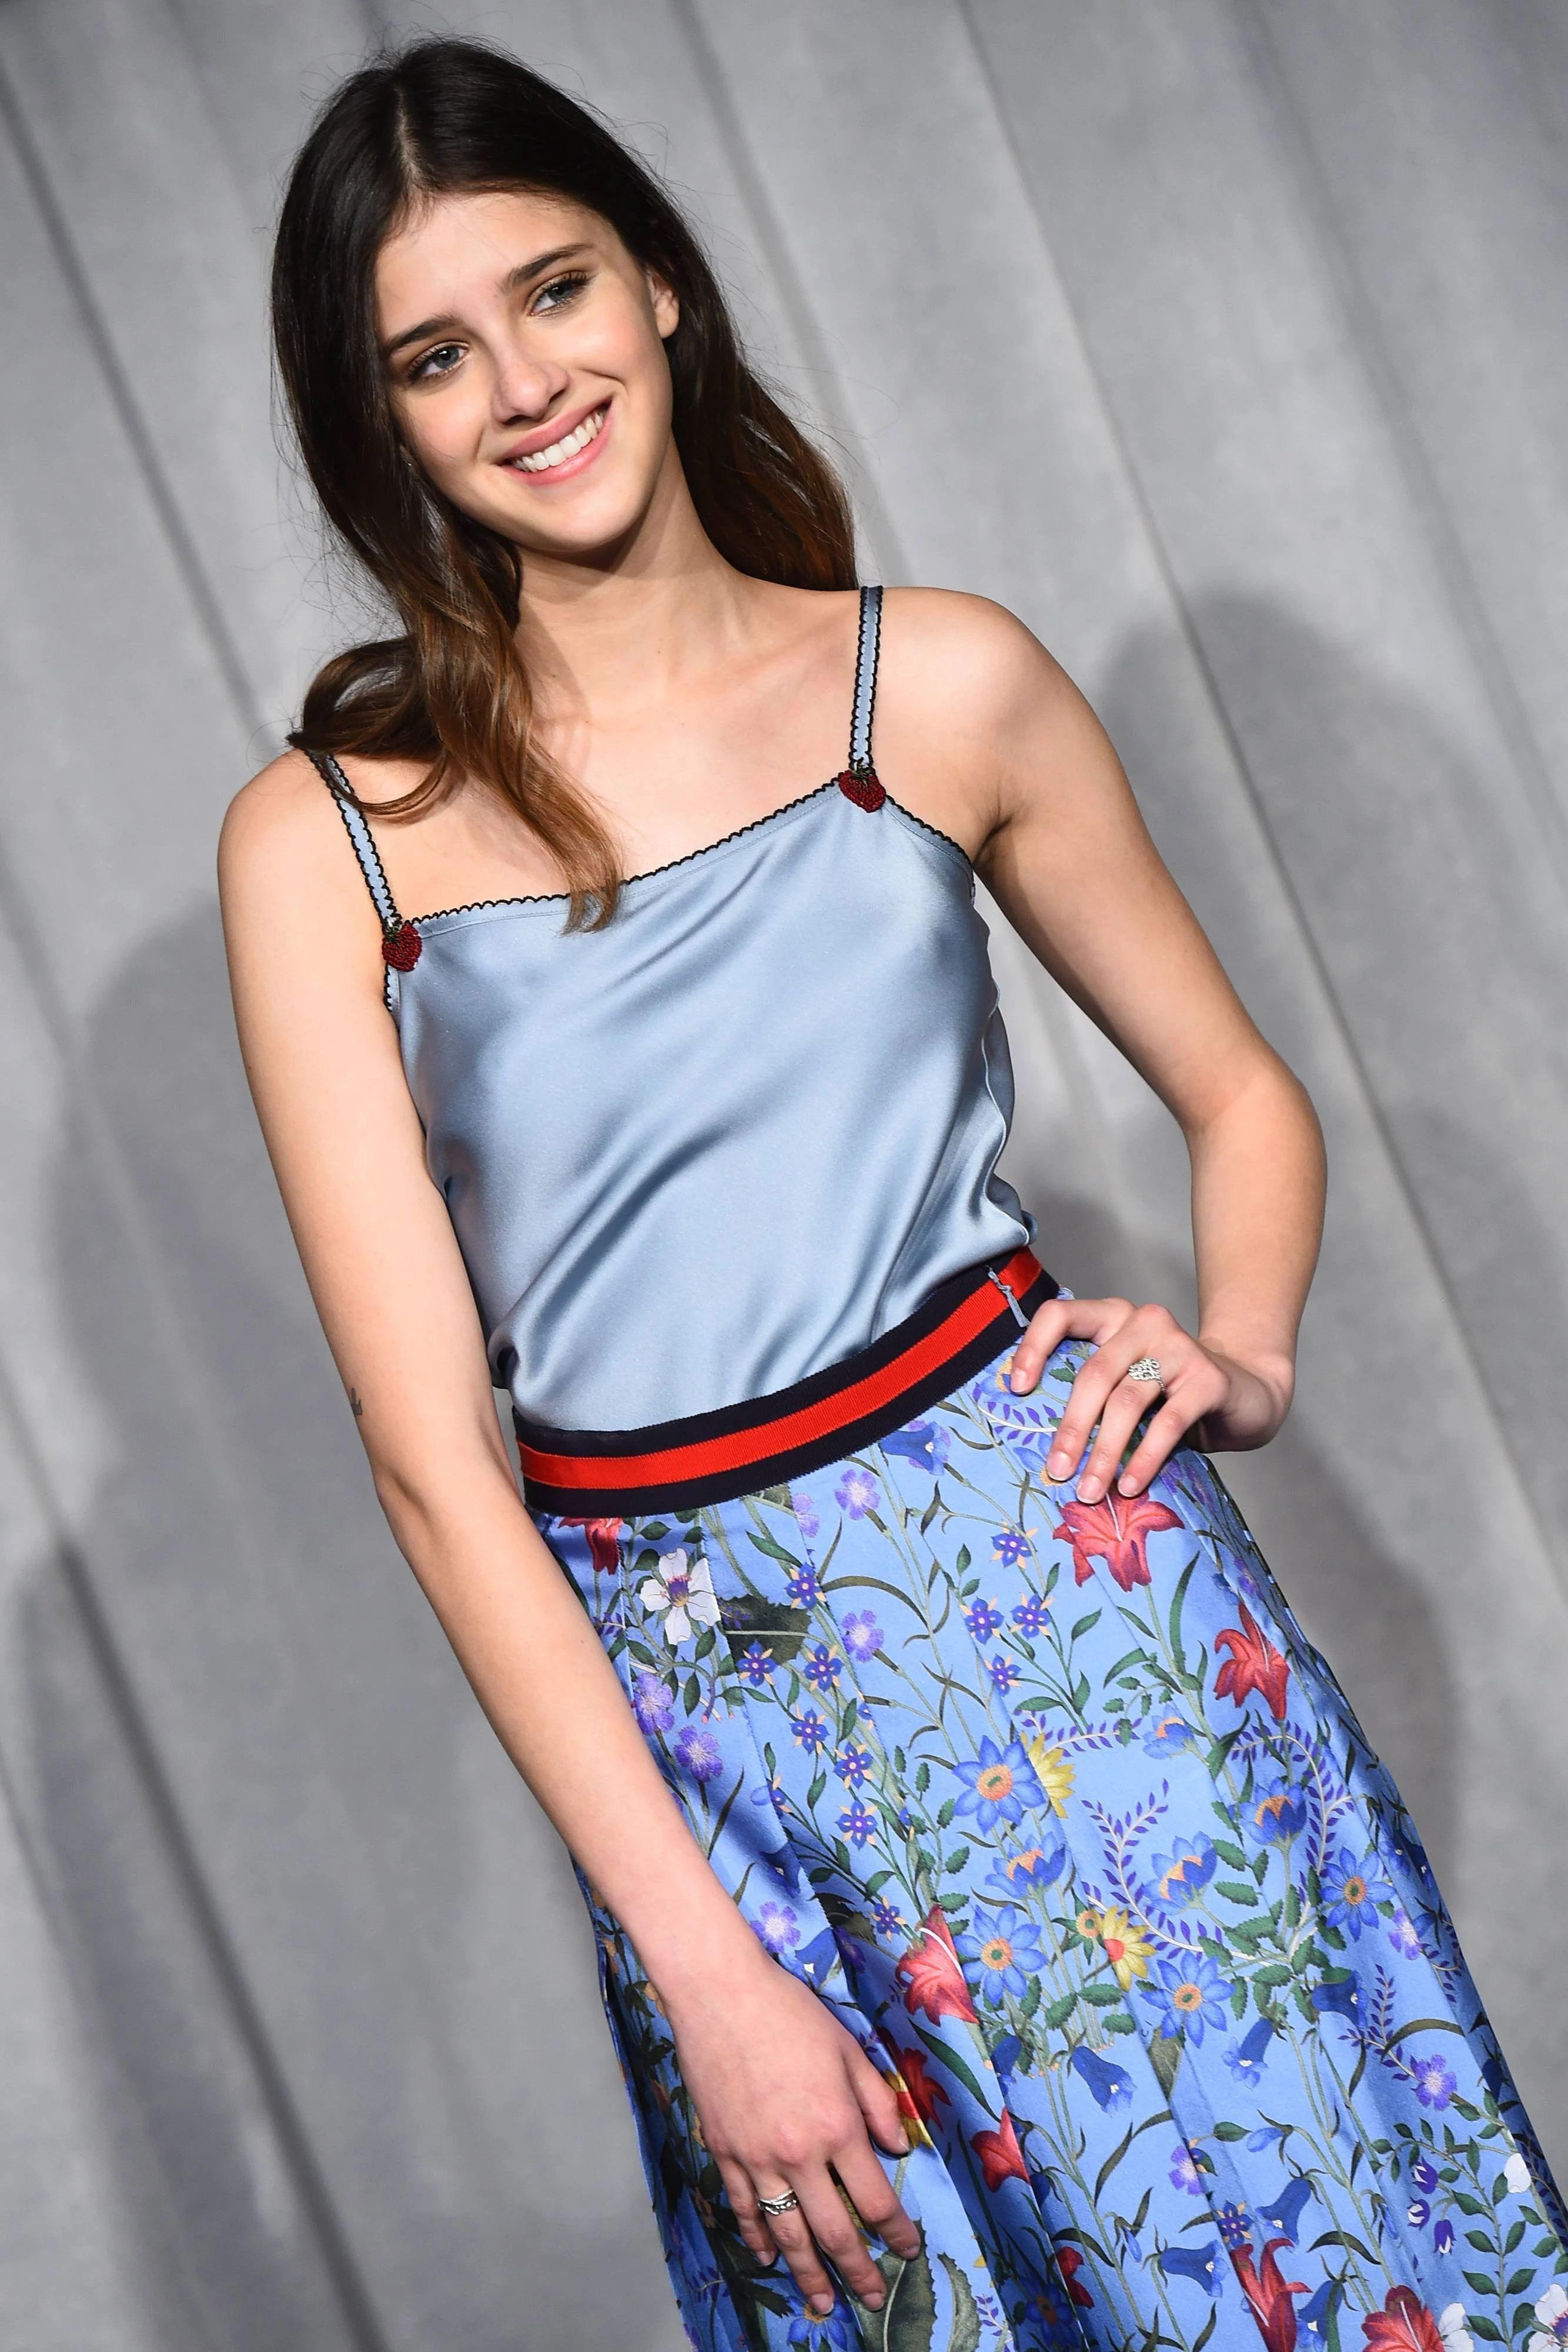 Benedetta Porcaroli en robe